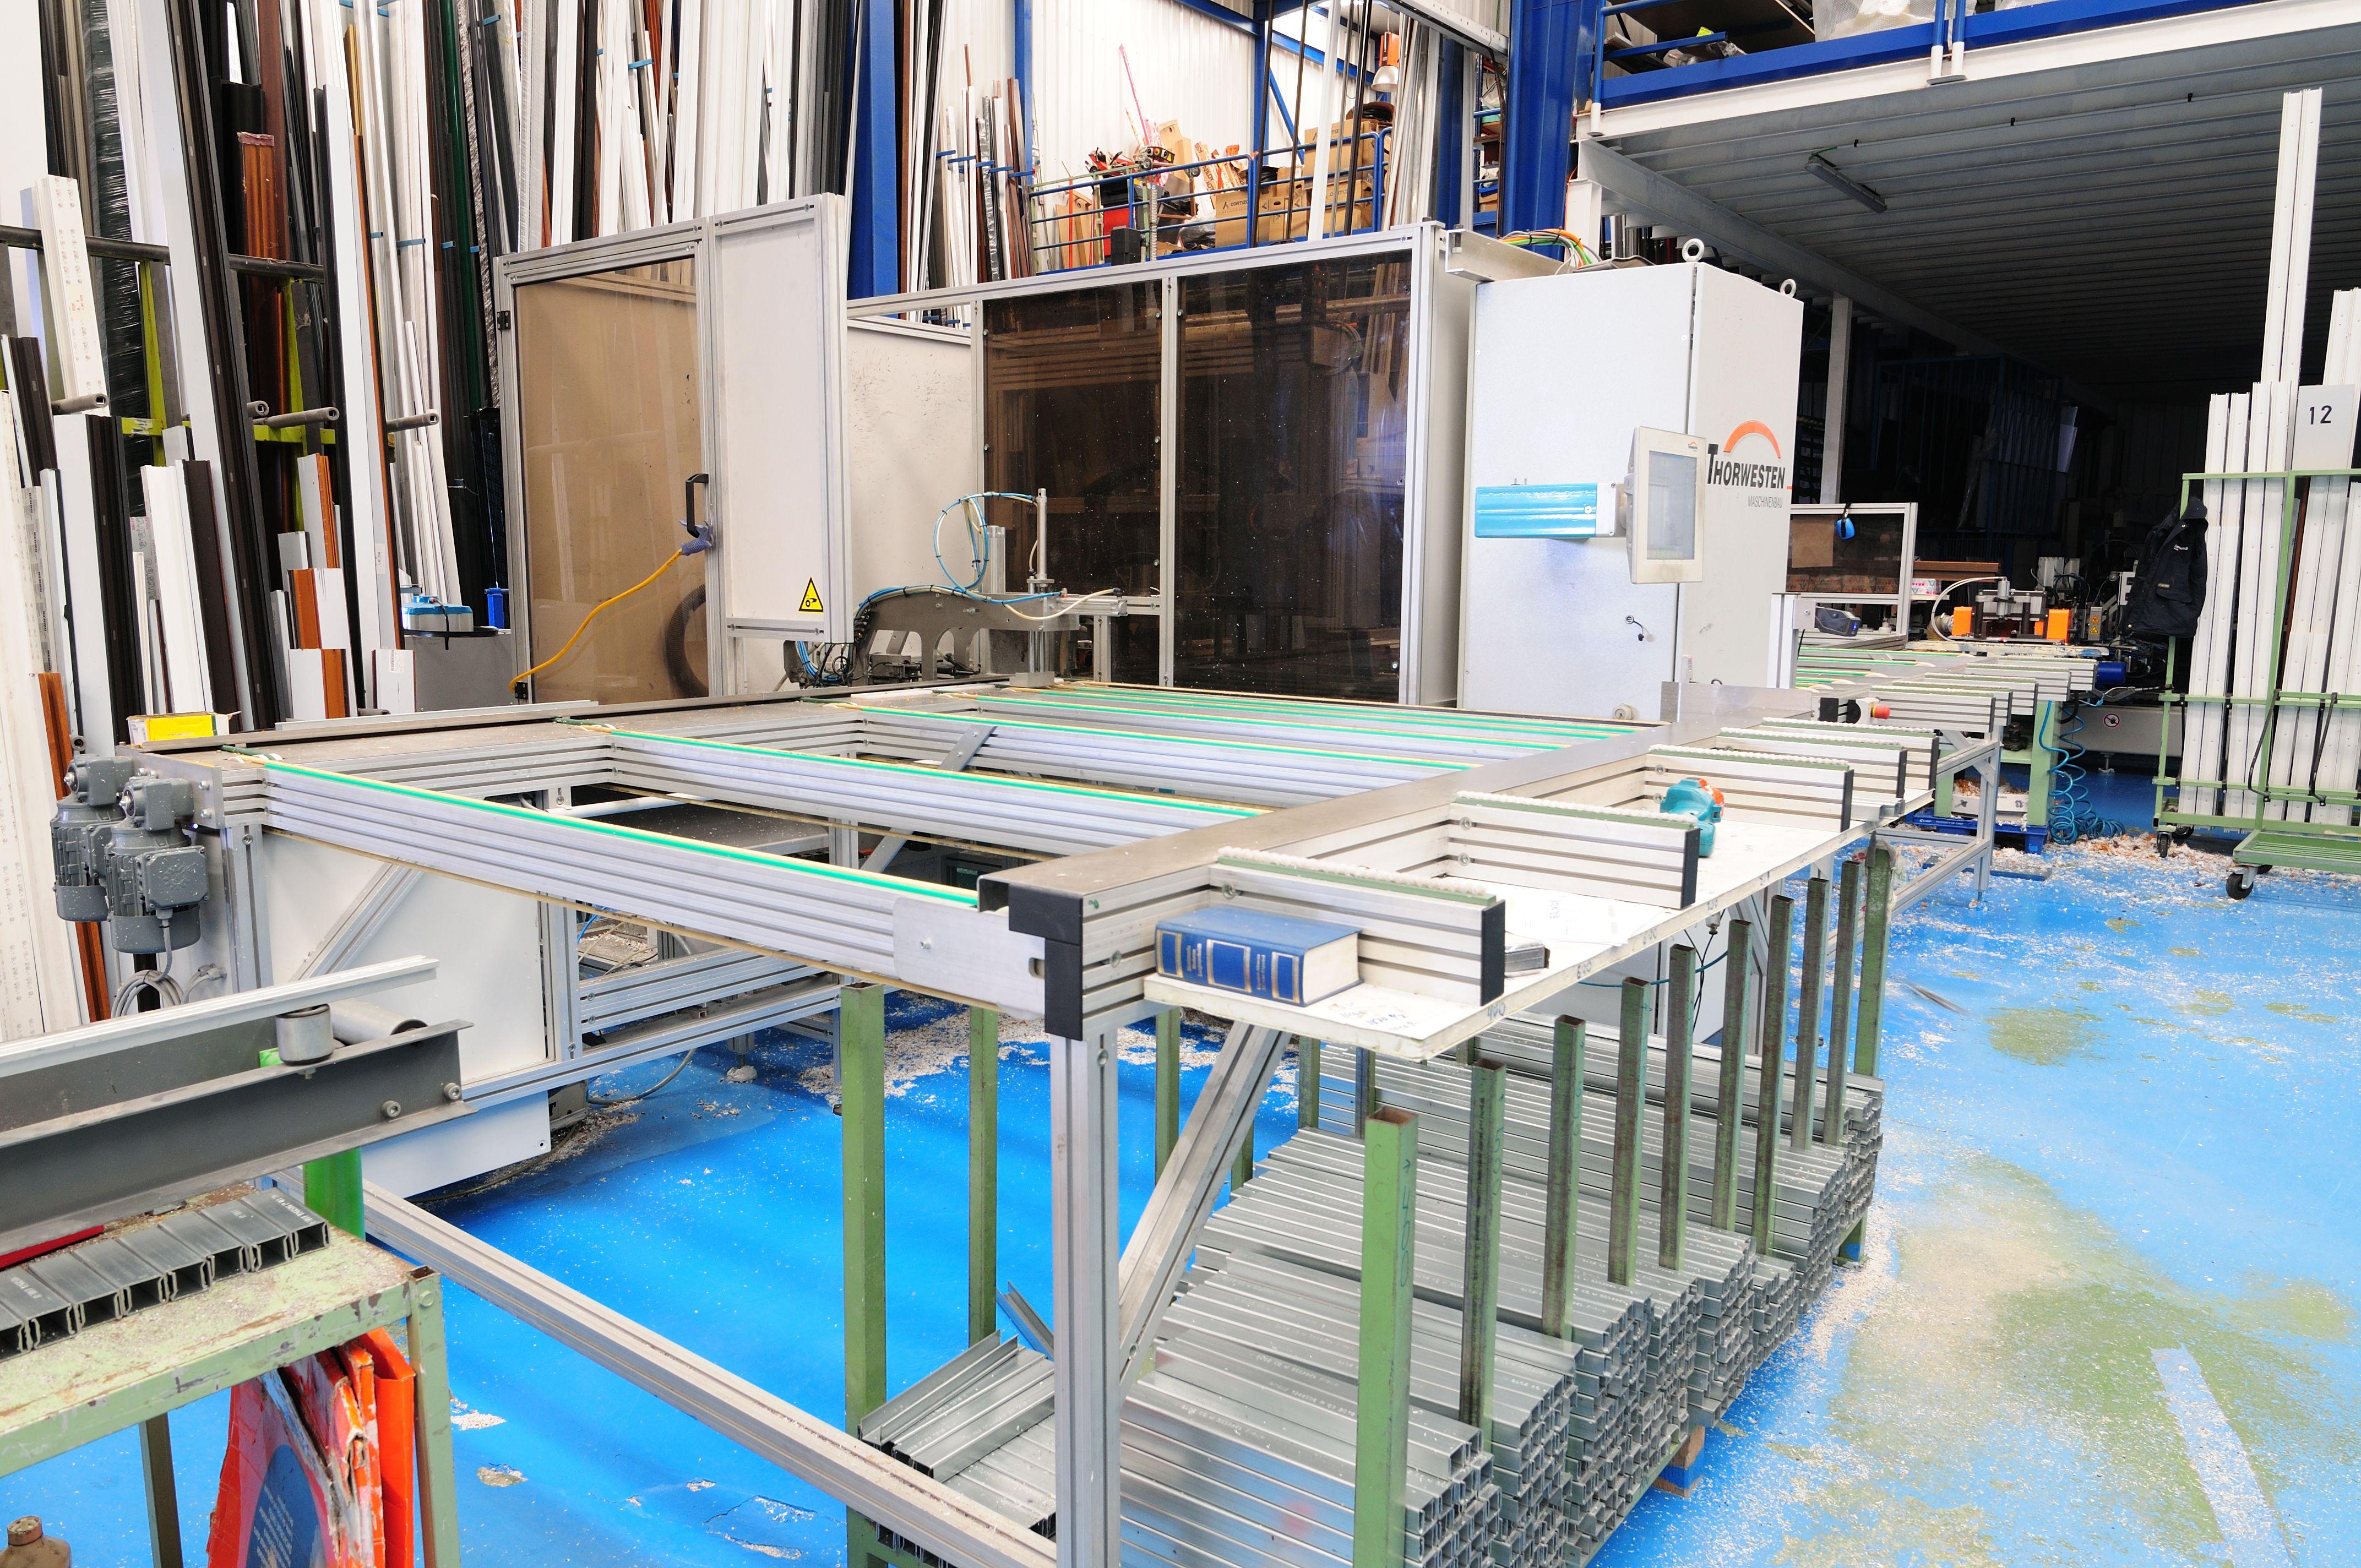 Fabricamos ventanas con diferentes aperturas: oscilobatientes, batientes